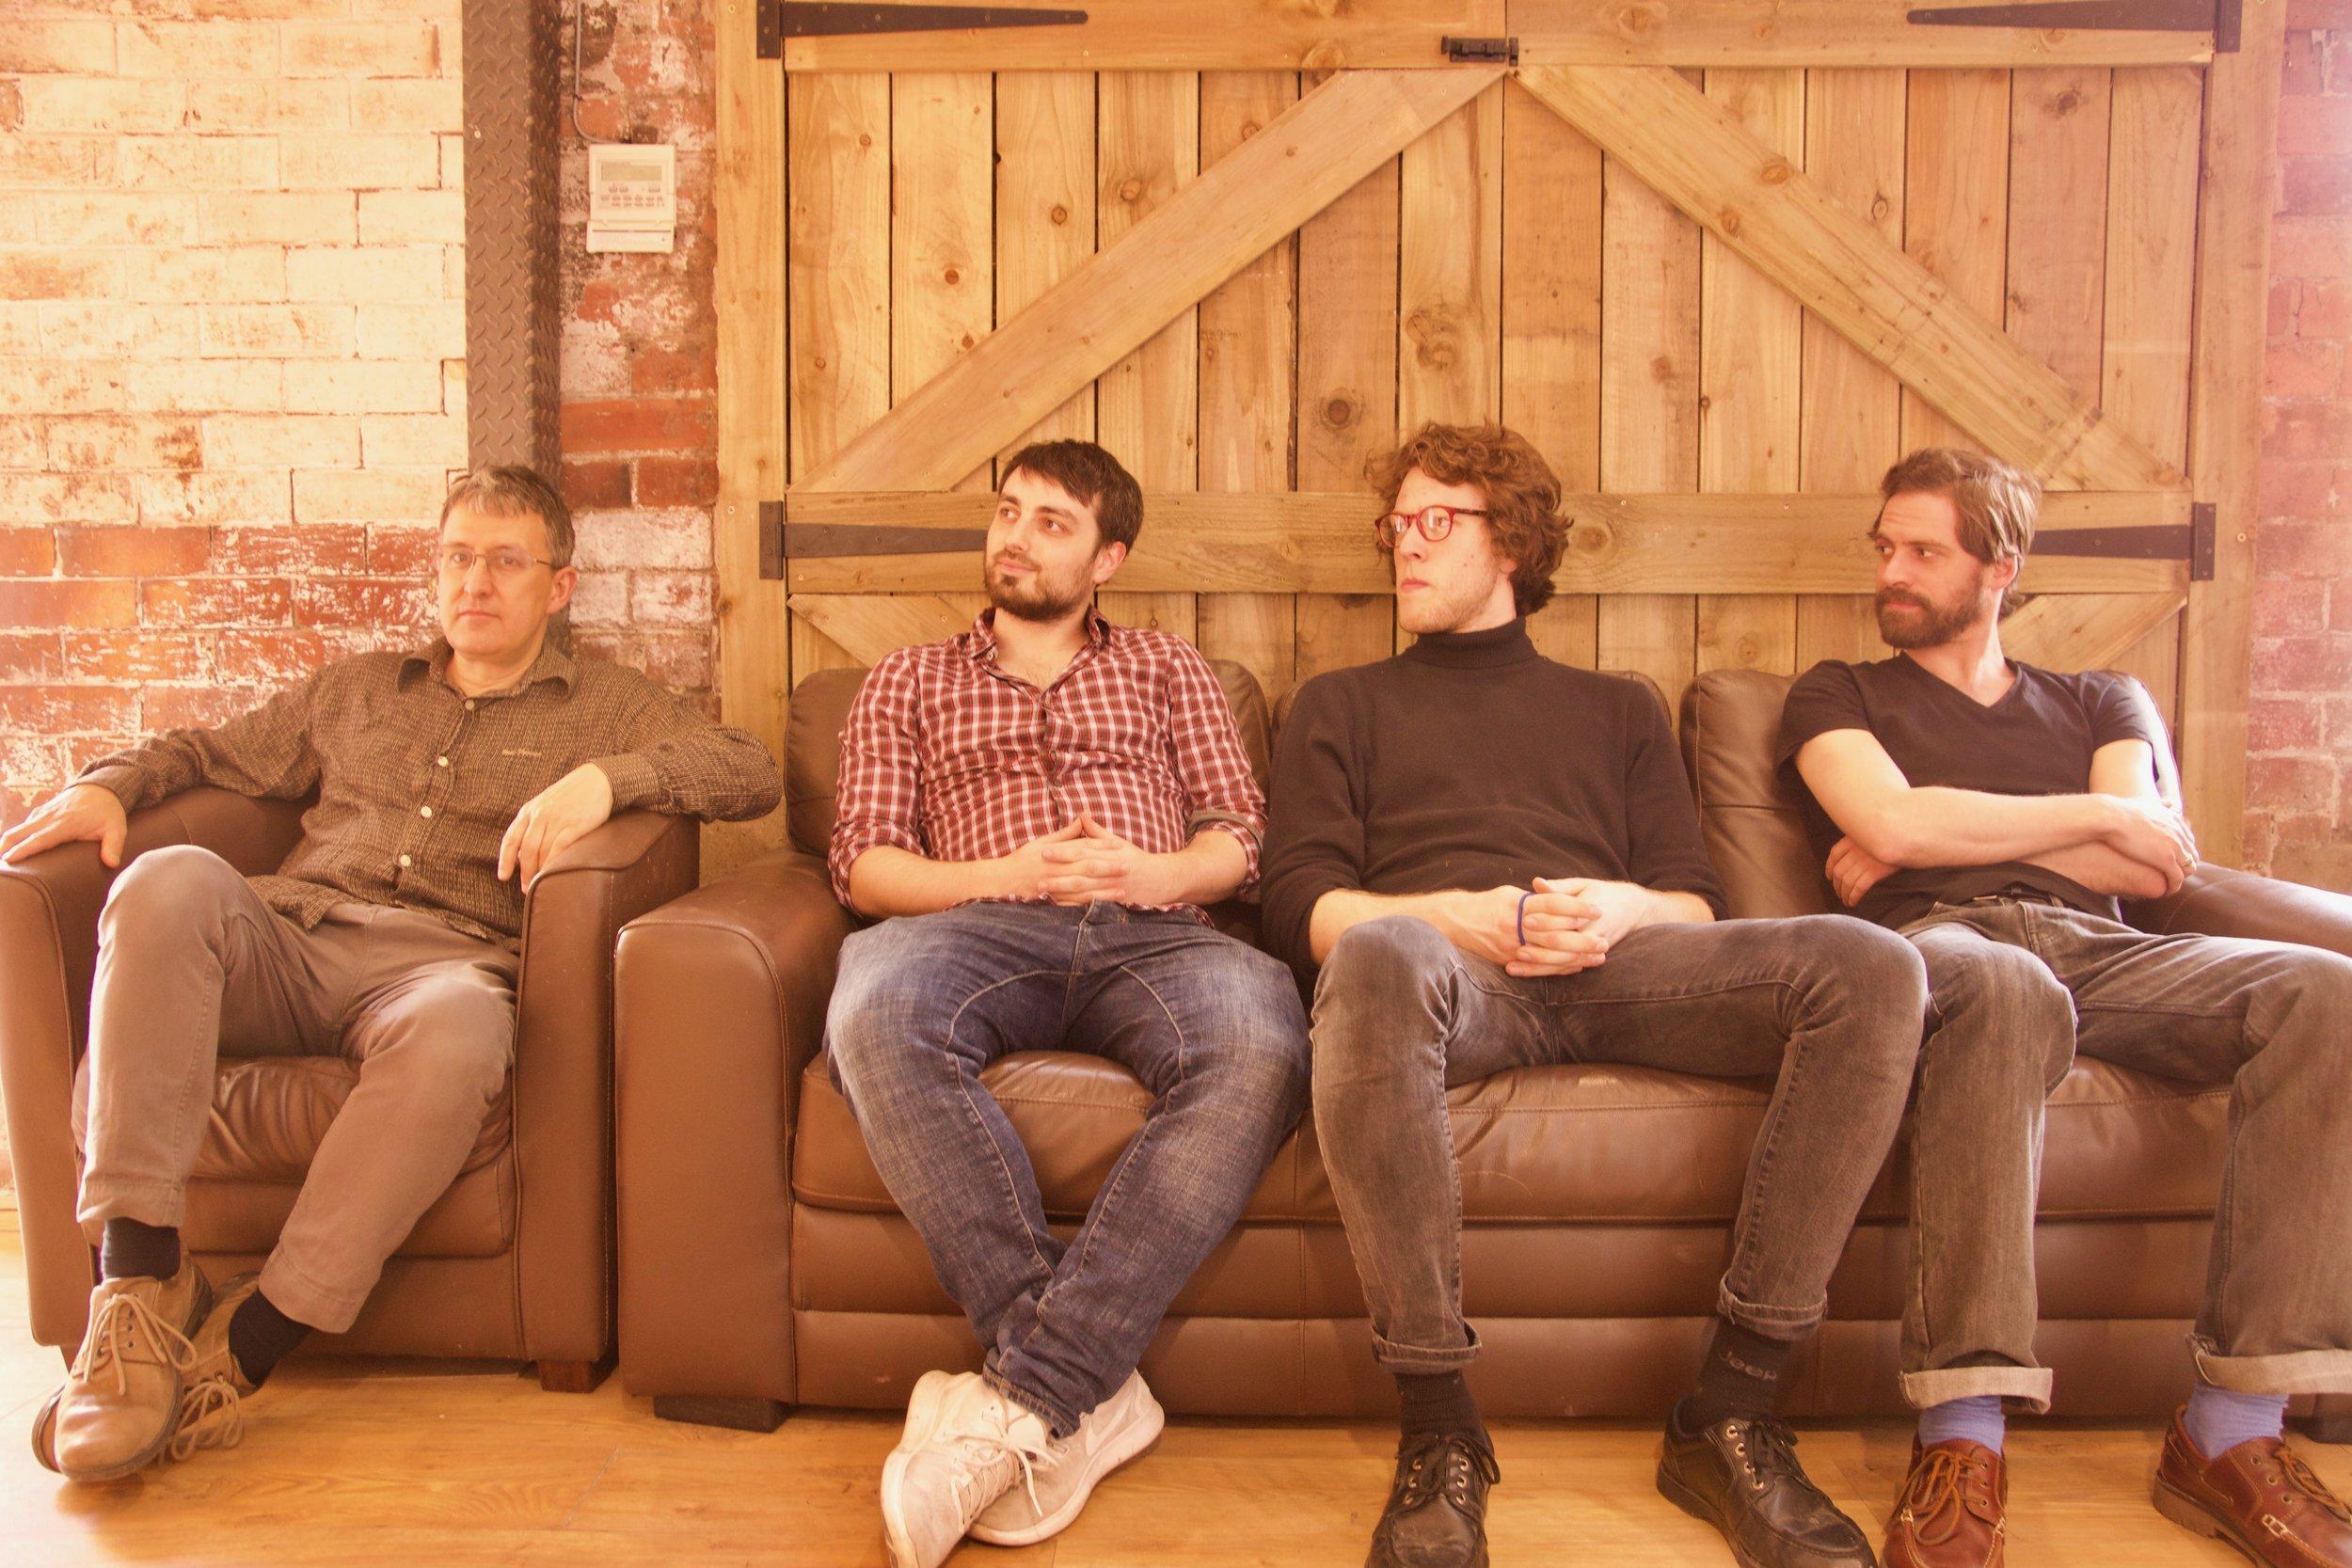 Left to Right: John Law, James Mainwaring, Billy Weir, Ashley John Long